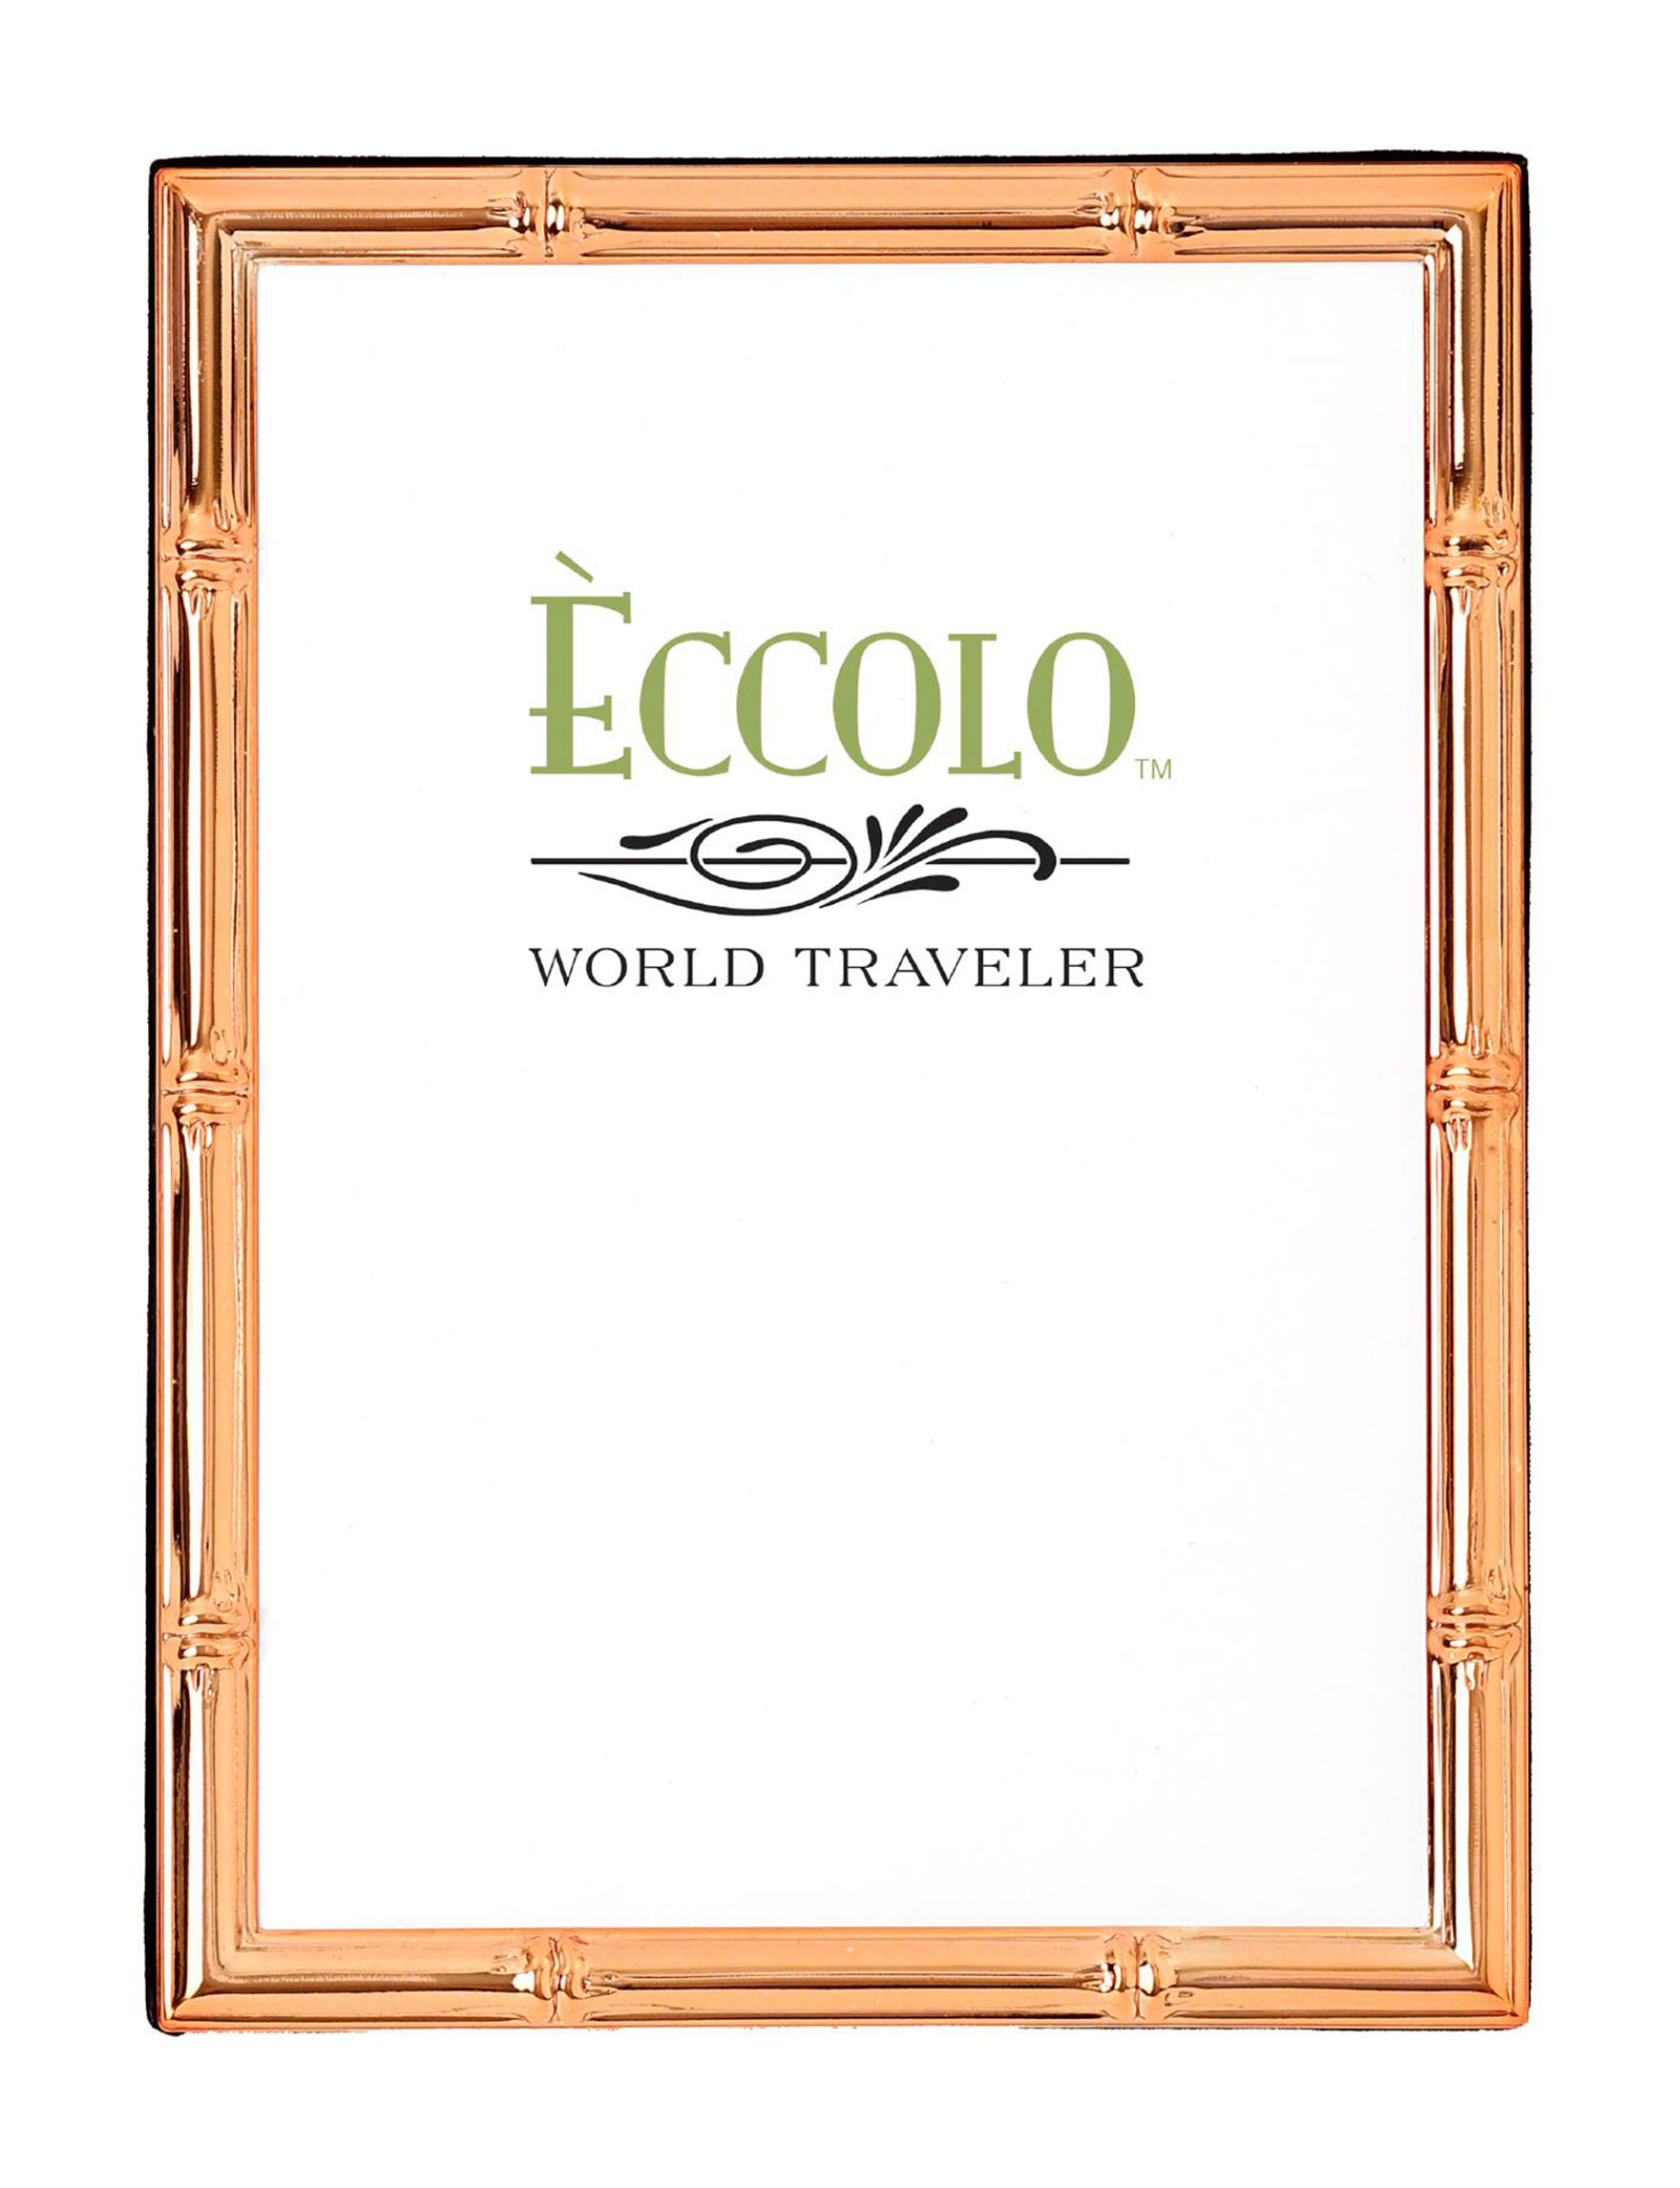 Eccolo Copper Frames & Shadow Boxes Home Accents